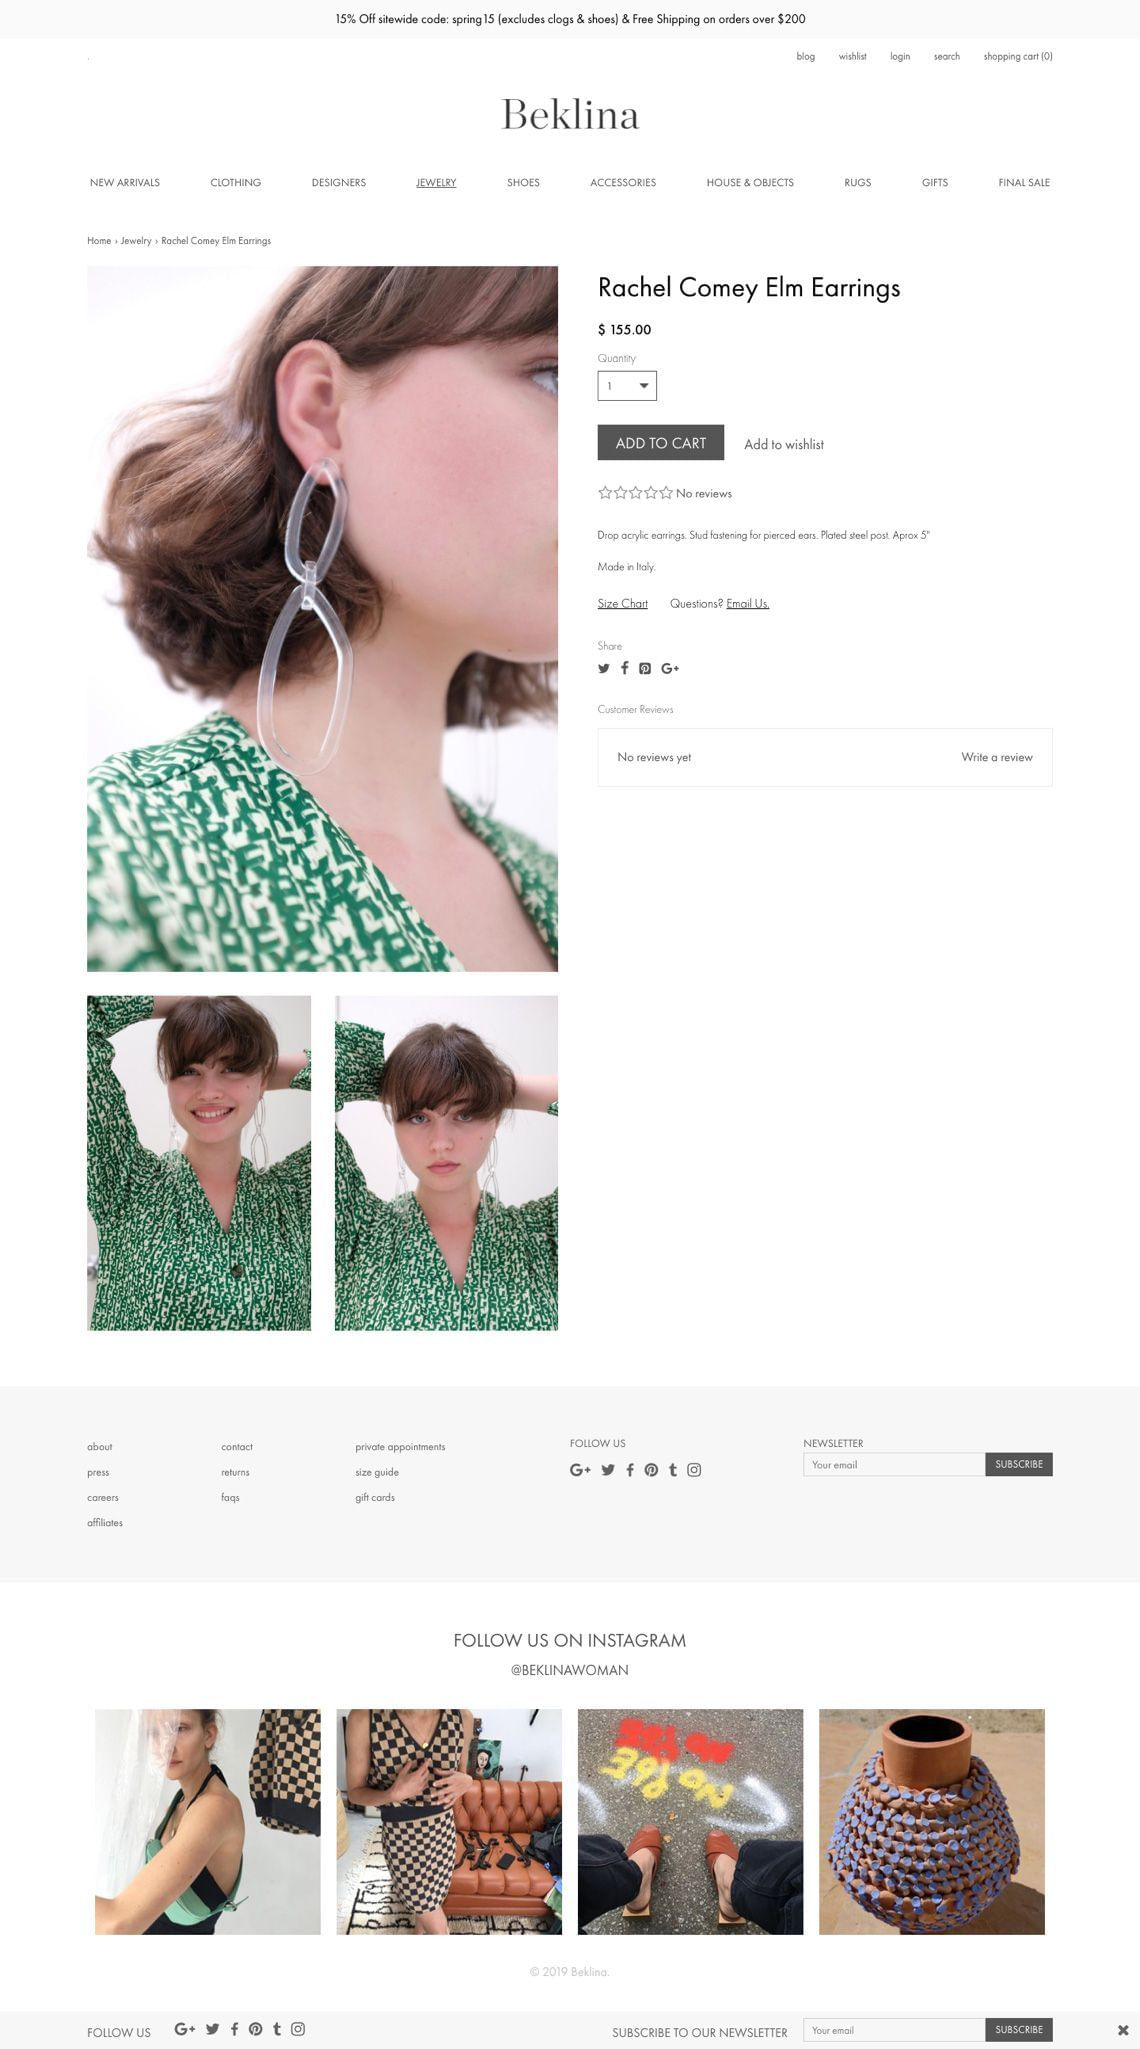 Beklina Product Page